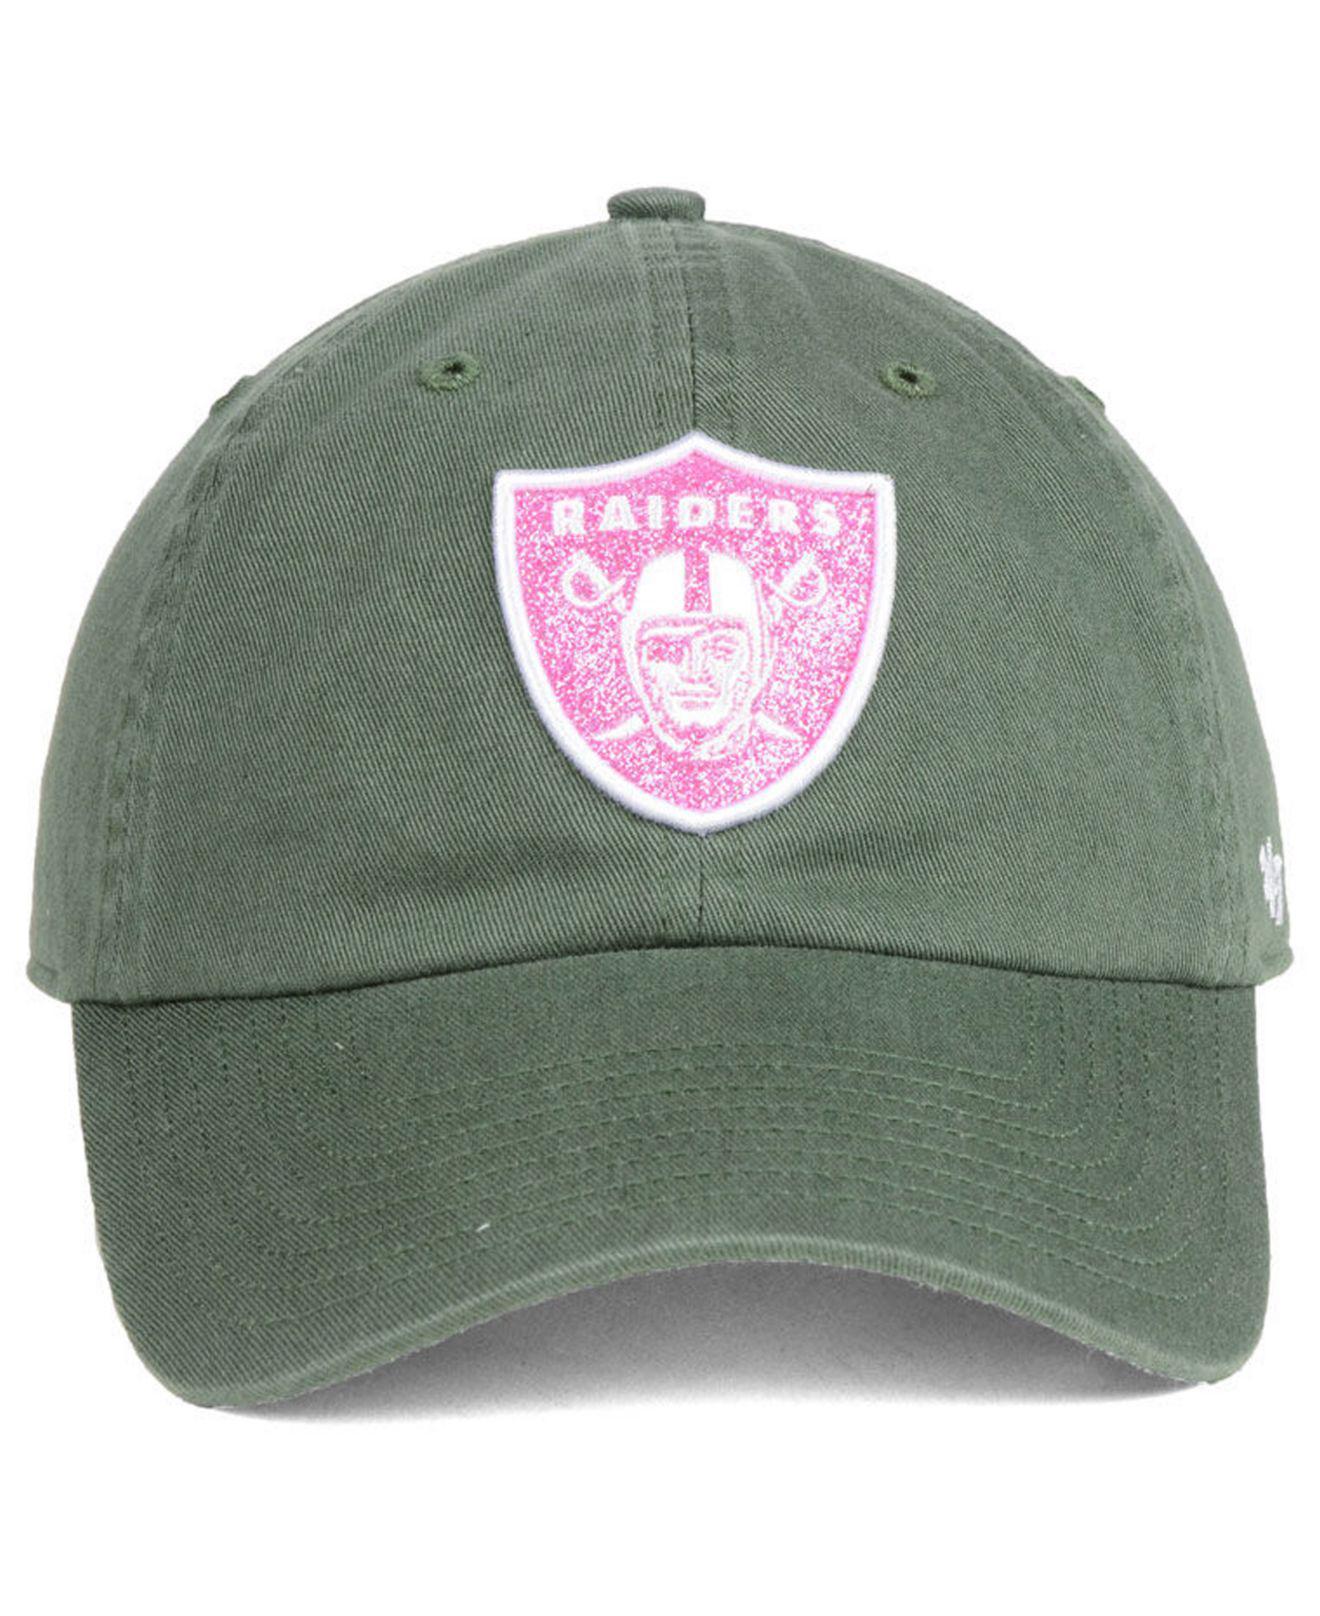 quality design b4888 5733a Lyst - 47 Brand Oakland Raiders Moss Glitta Clean Up Cap in Green